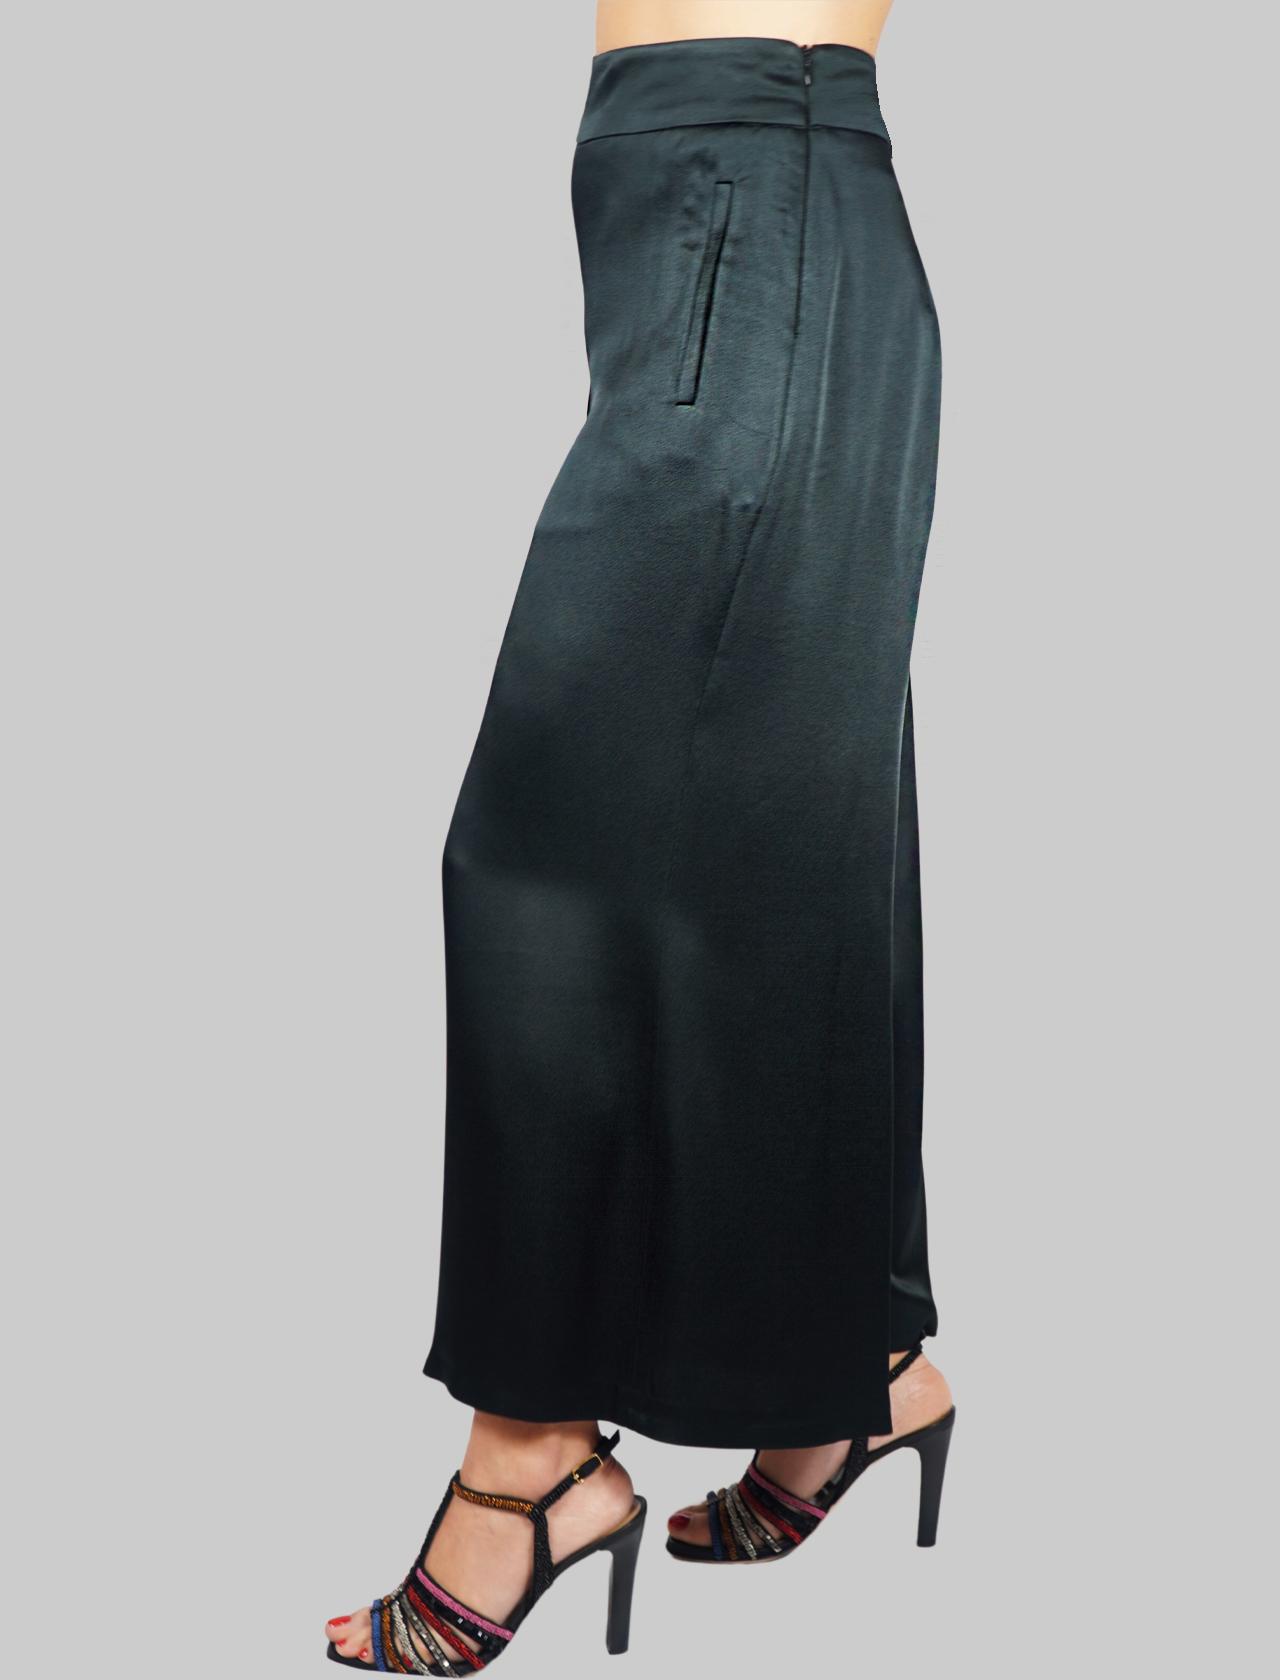 Abbigliamento Donna Pantalone Liquid Cady Nero Gamba Ampia Maliparmi | Gonne e Pantaloni | JH71915012320000